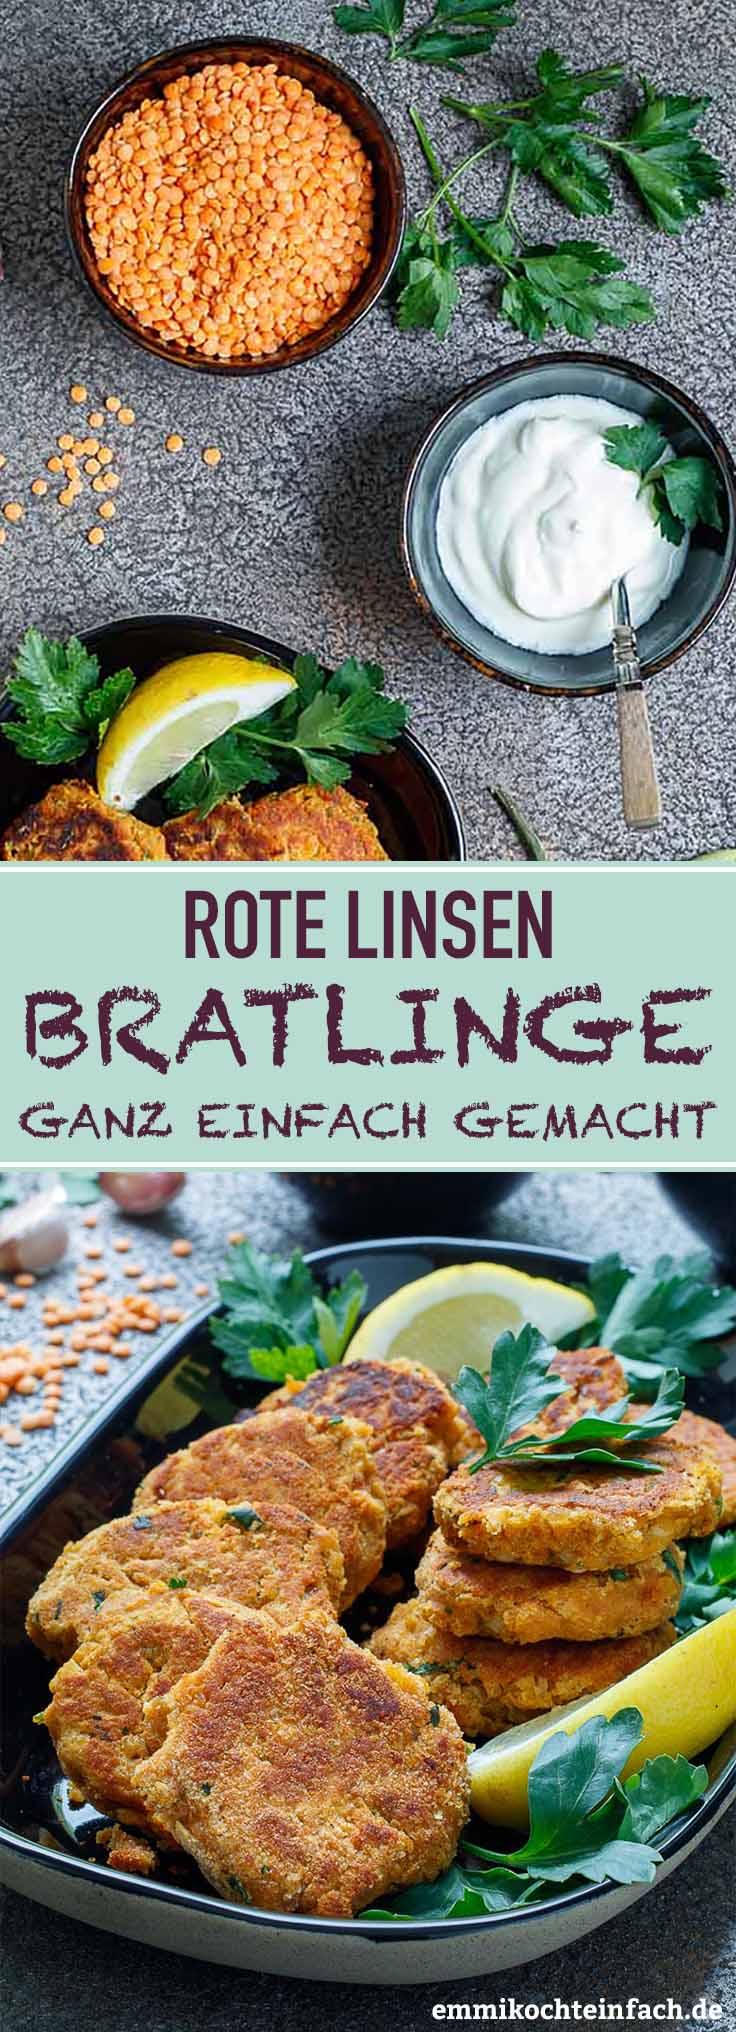 Rote Linsen Bratlinge - www.emmikochteinfach.de